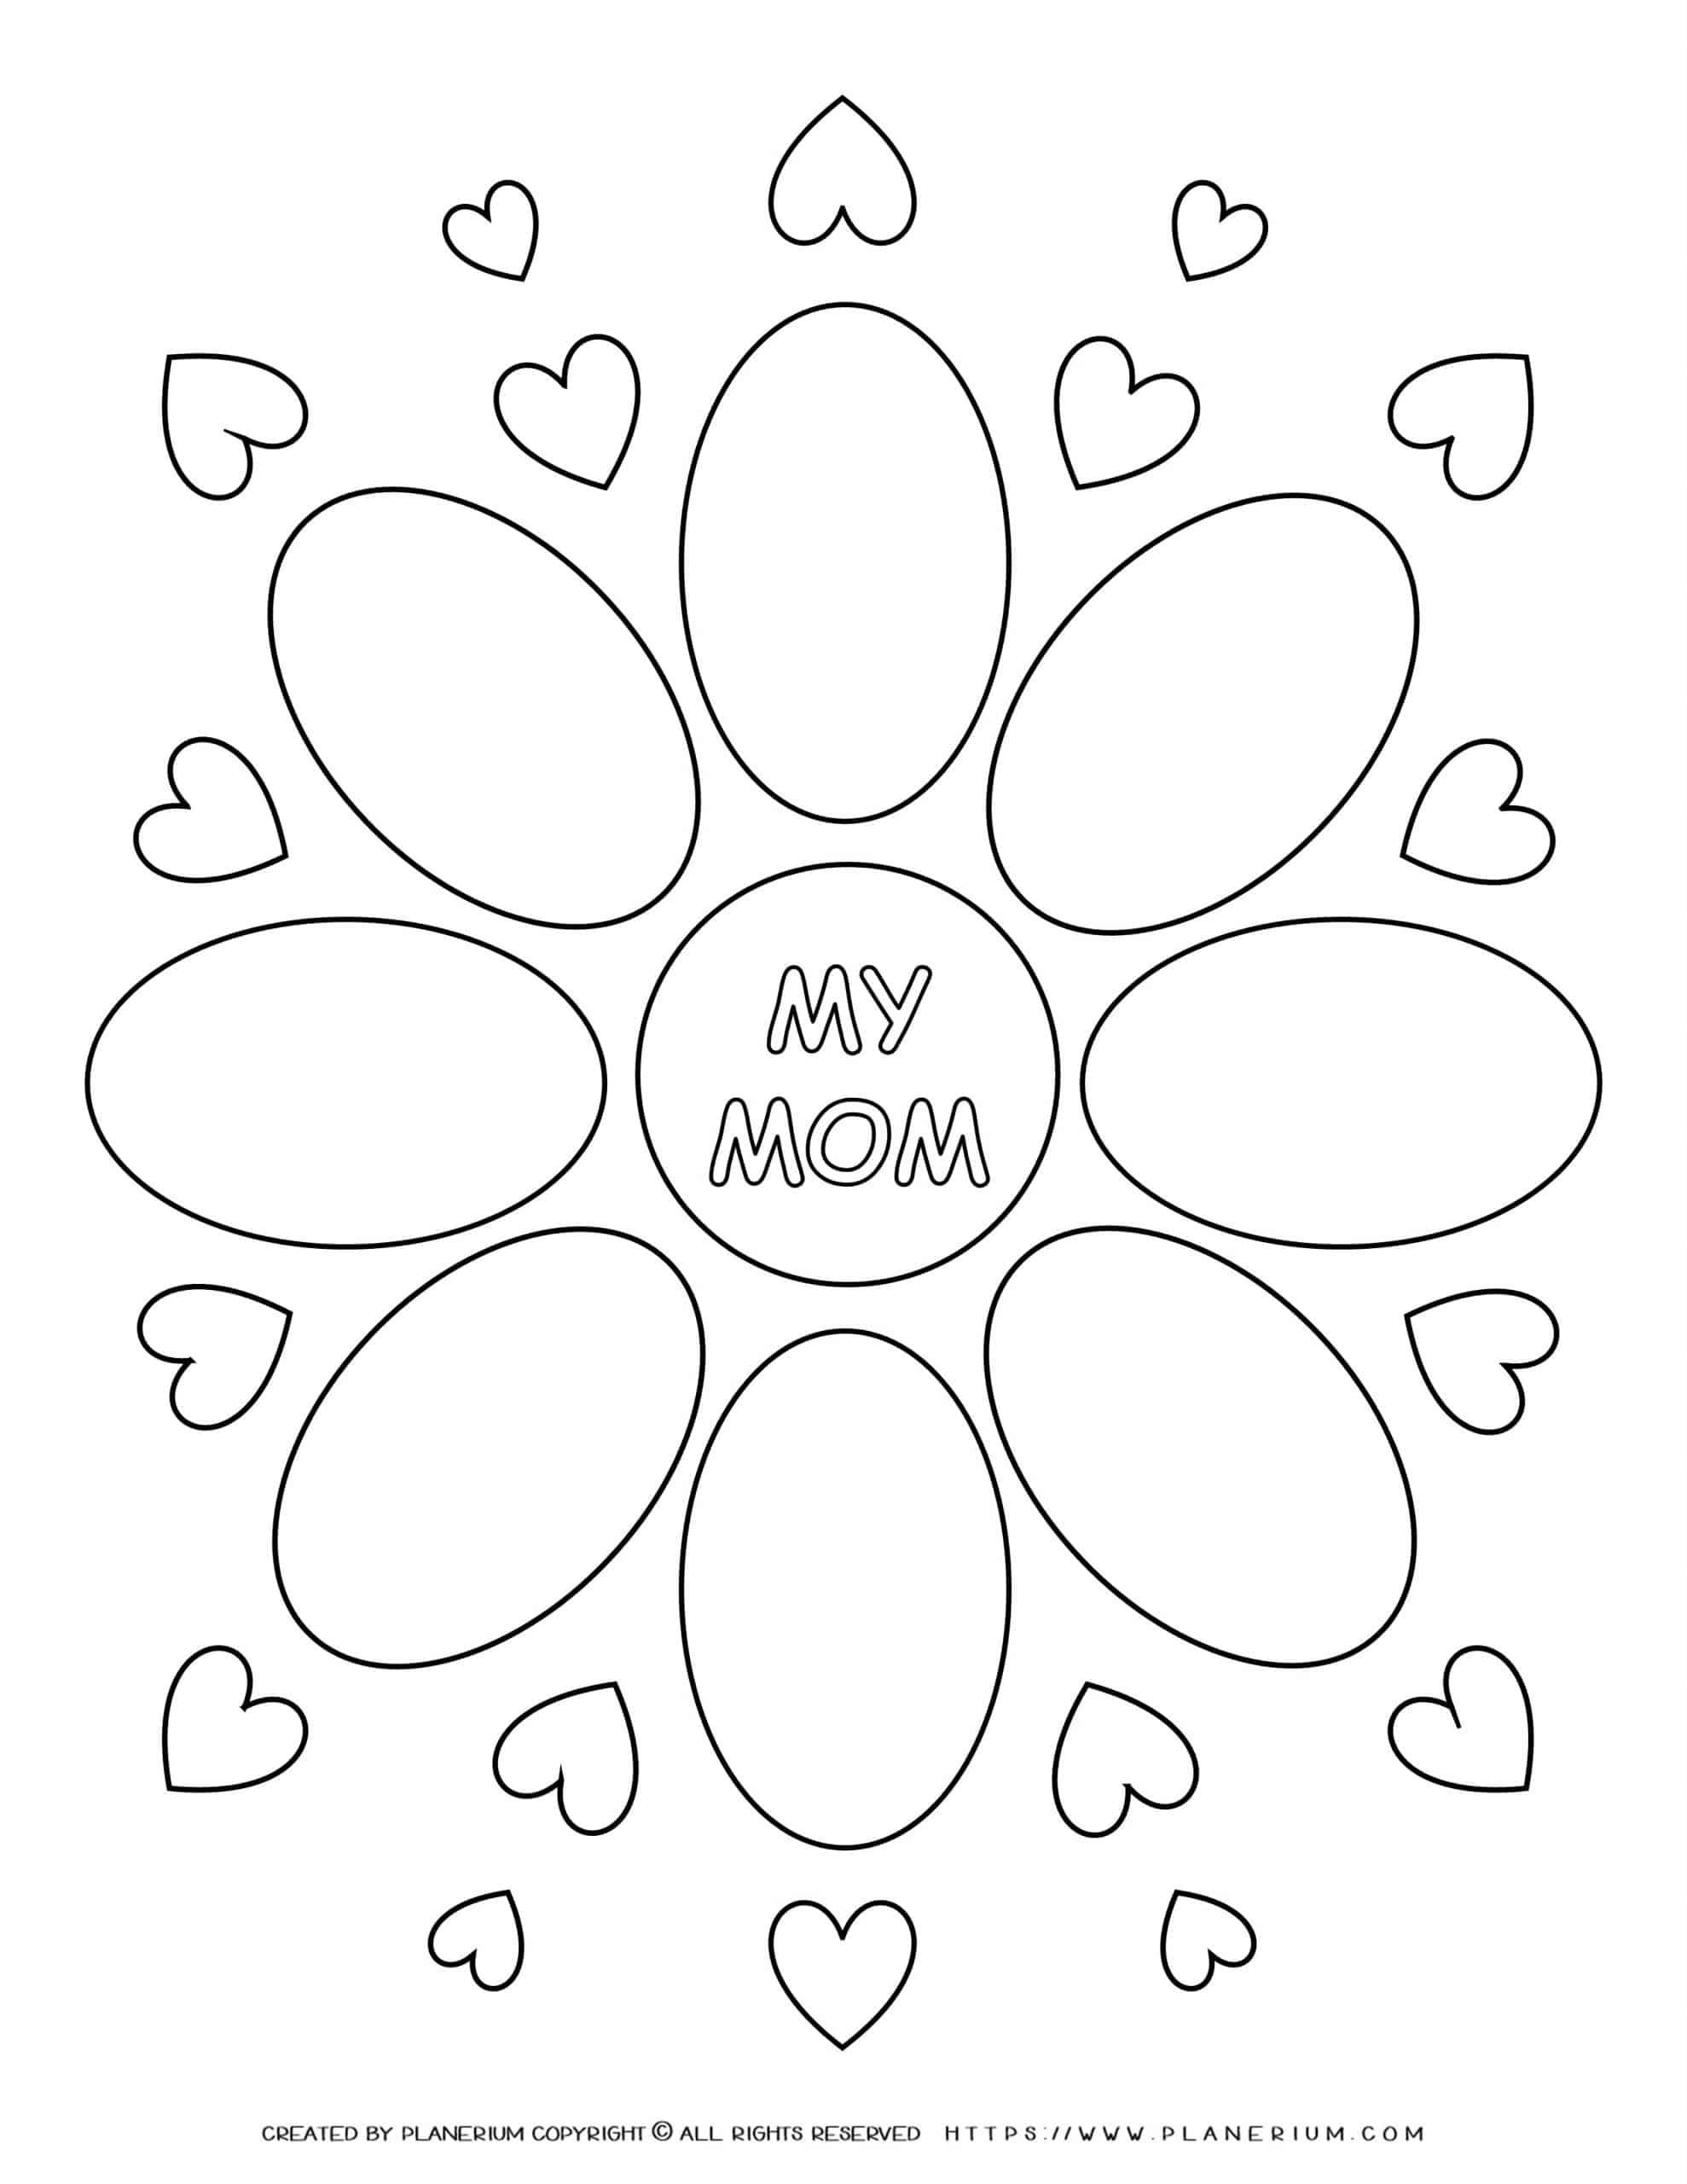 Mother's day - Worksheet - My mom Flower